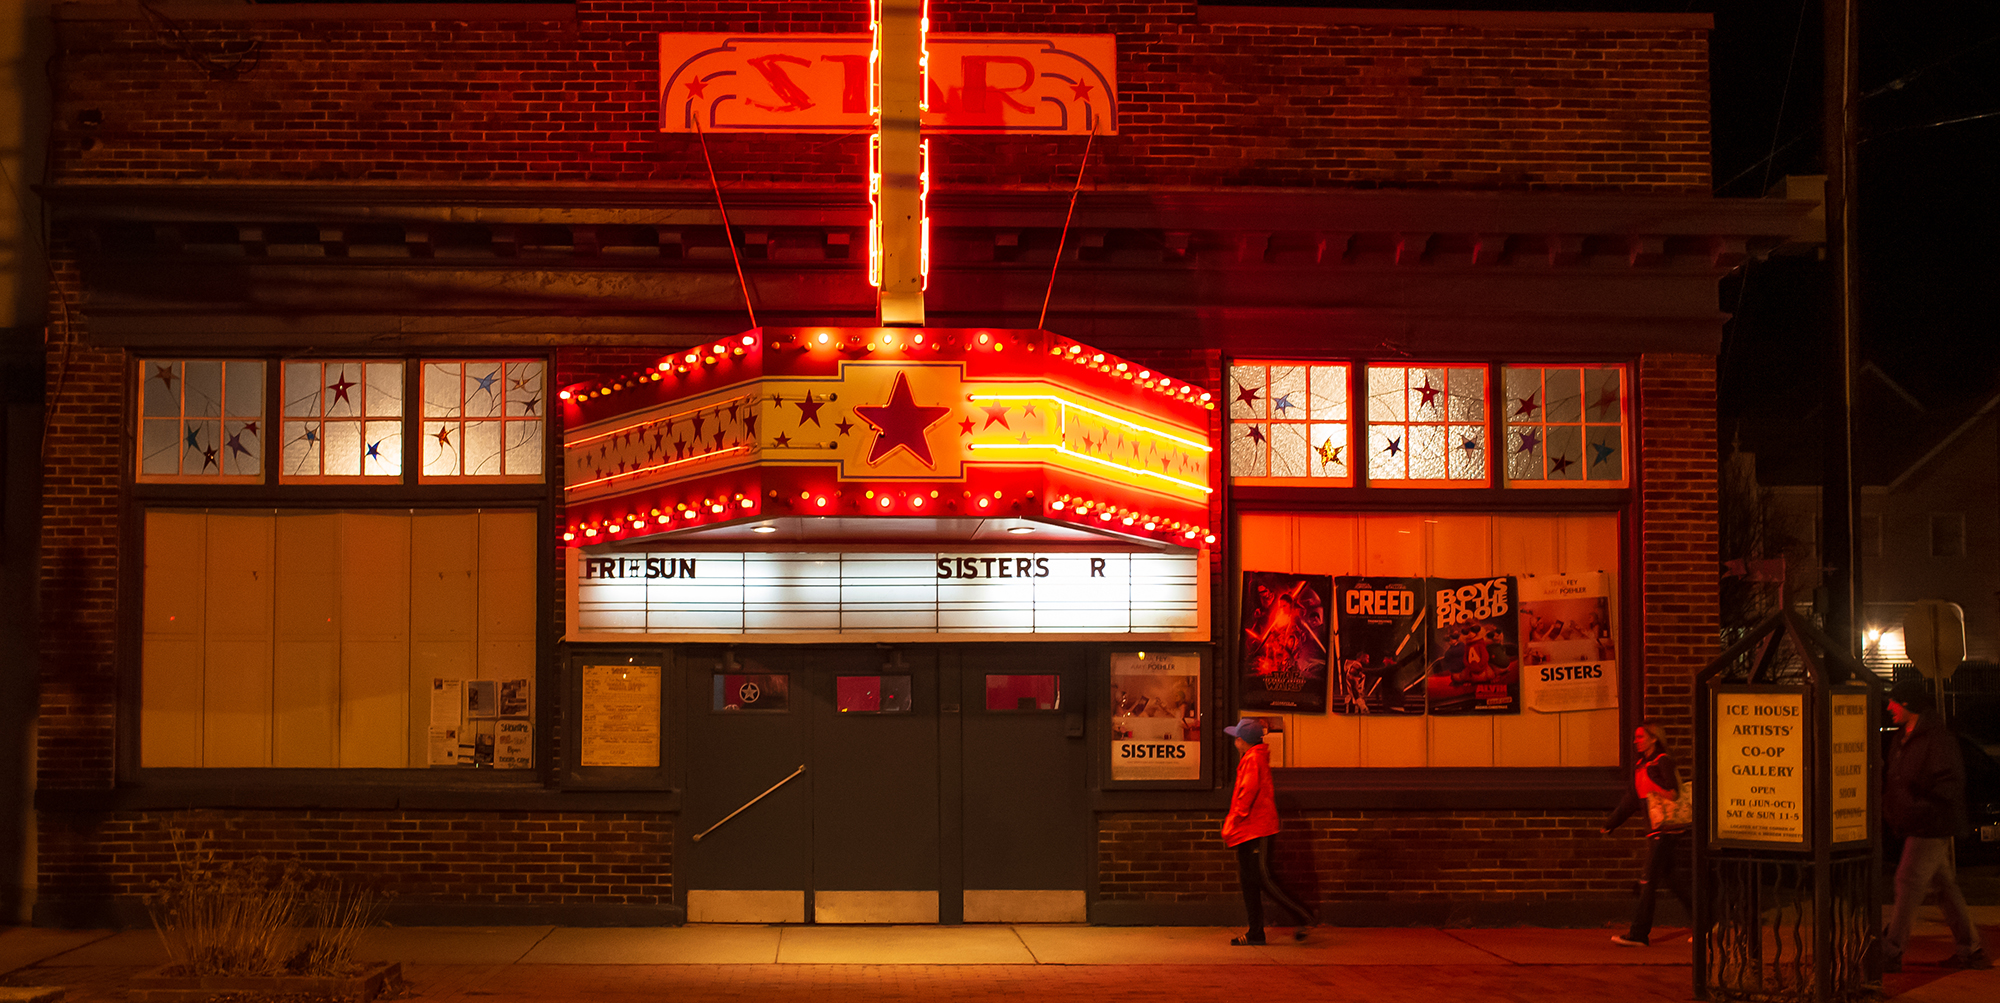 Goldenseal theater